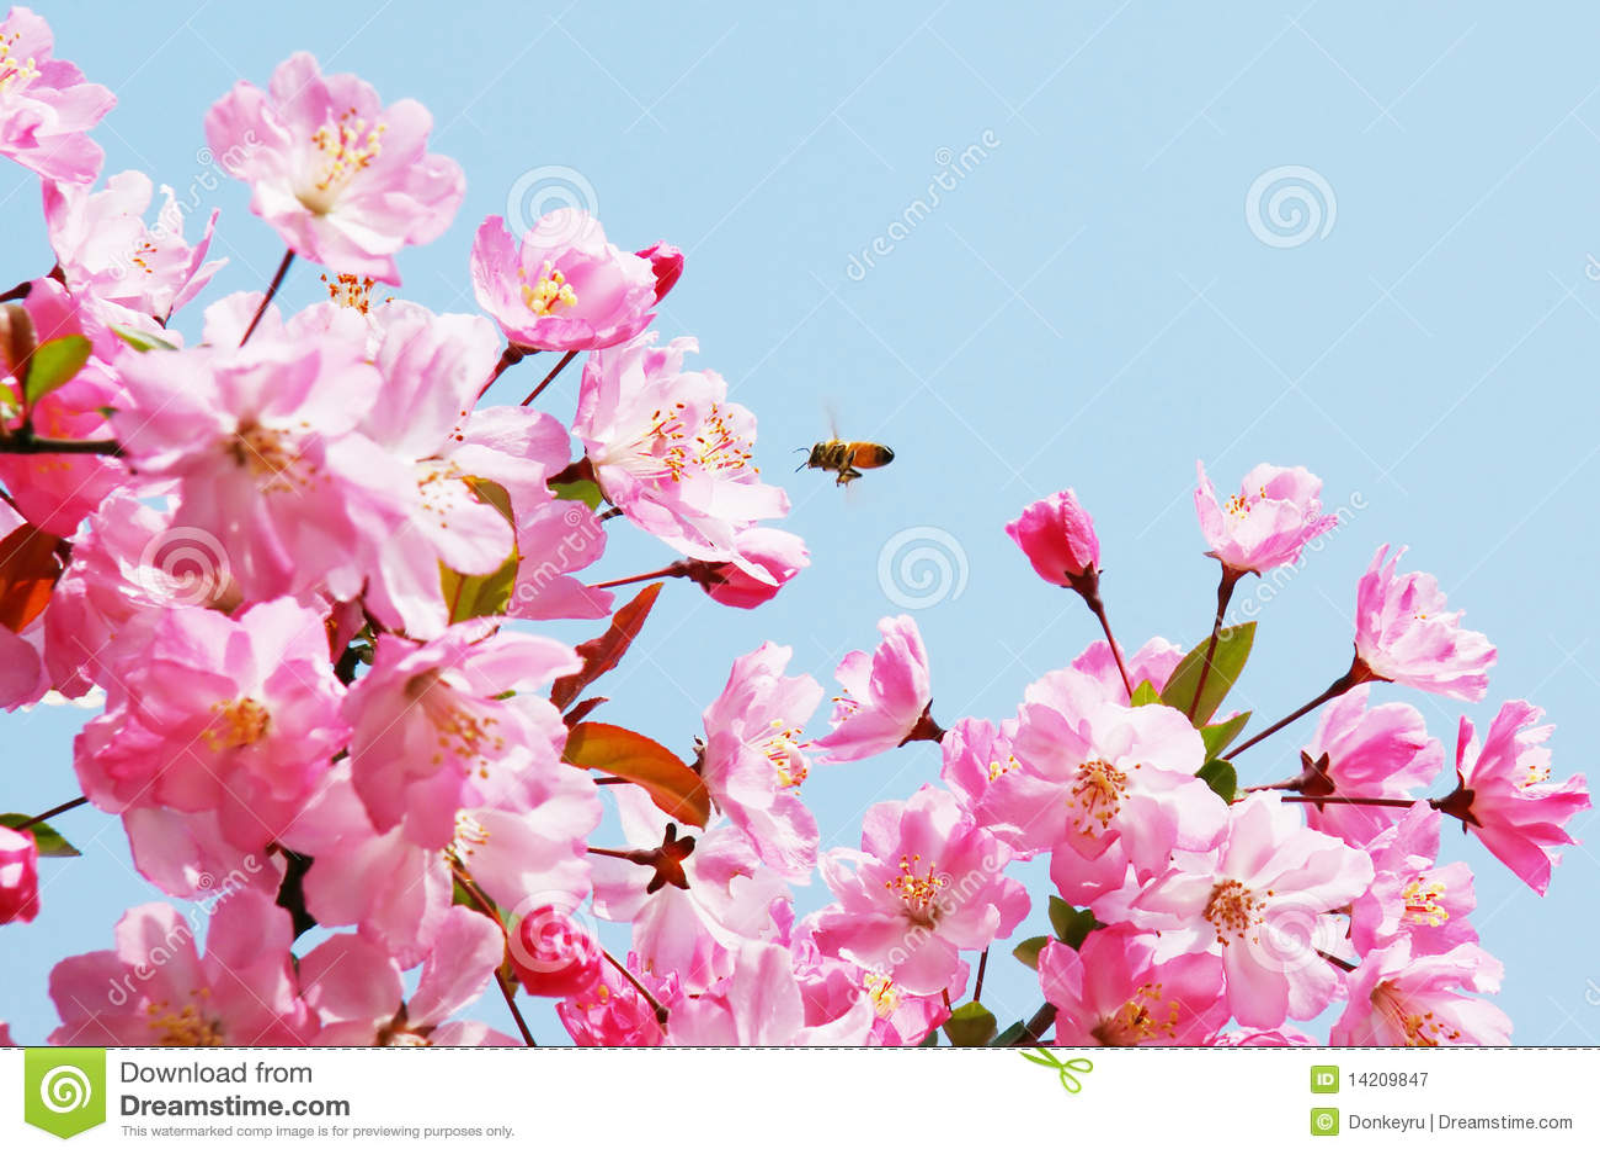 Flourish pink chinese flowering crab apple flowers stock image flourish pink chinese flowering crab apple flowers mightylinksfo